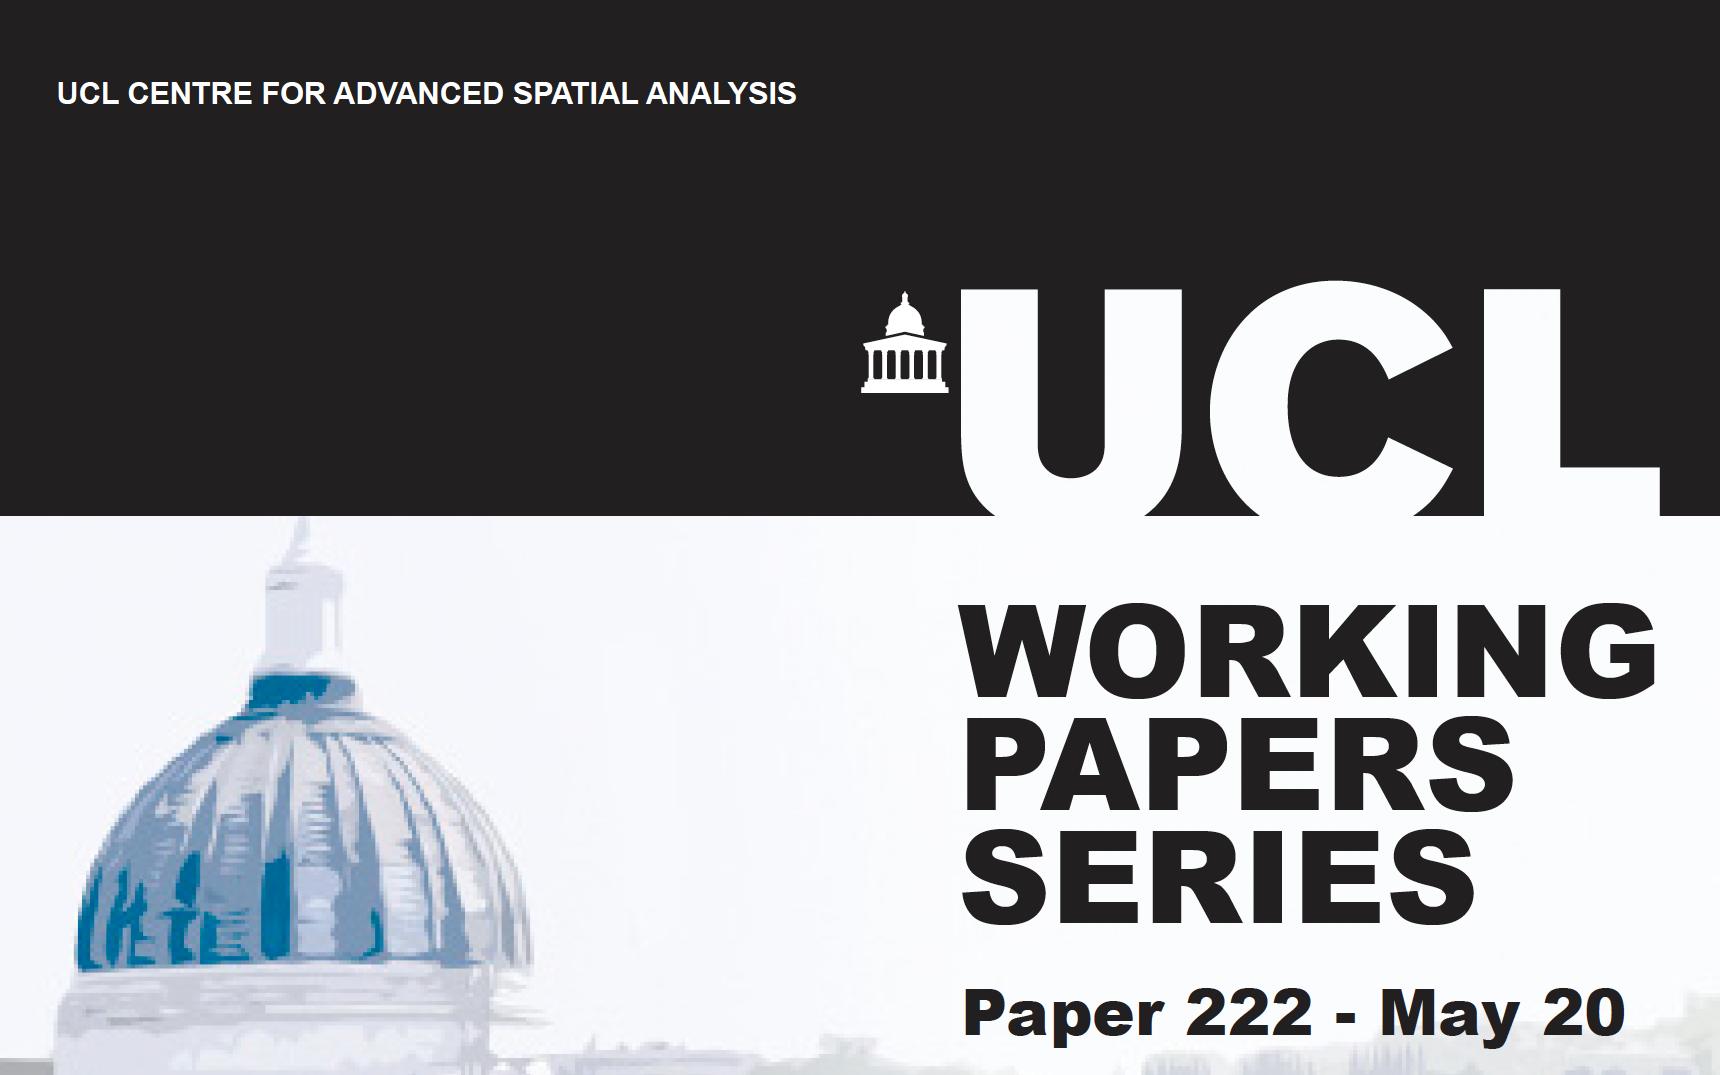 CASA Working Paper 222